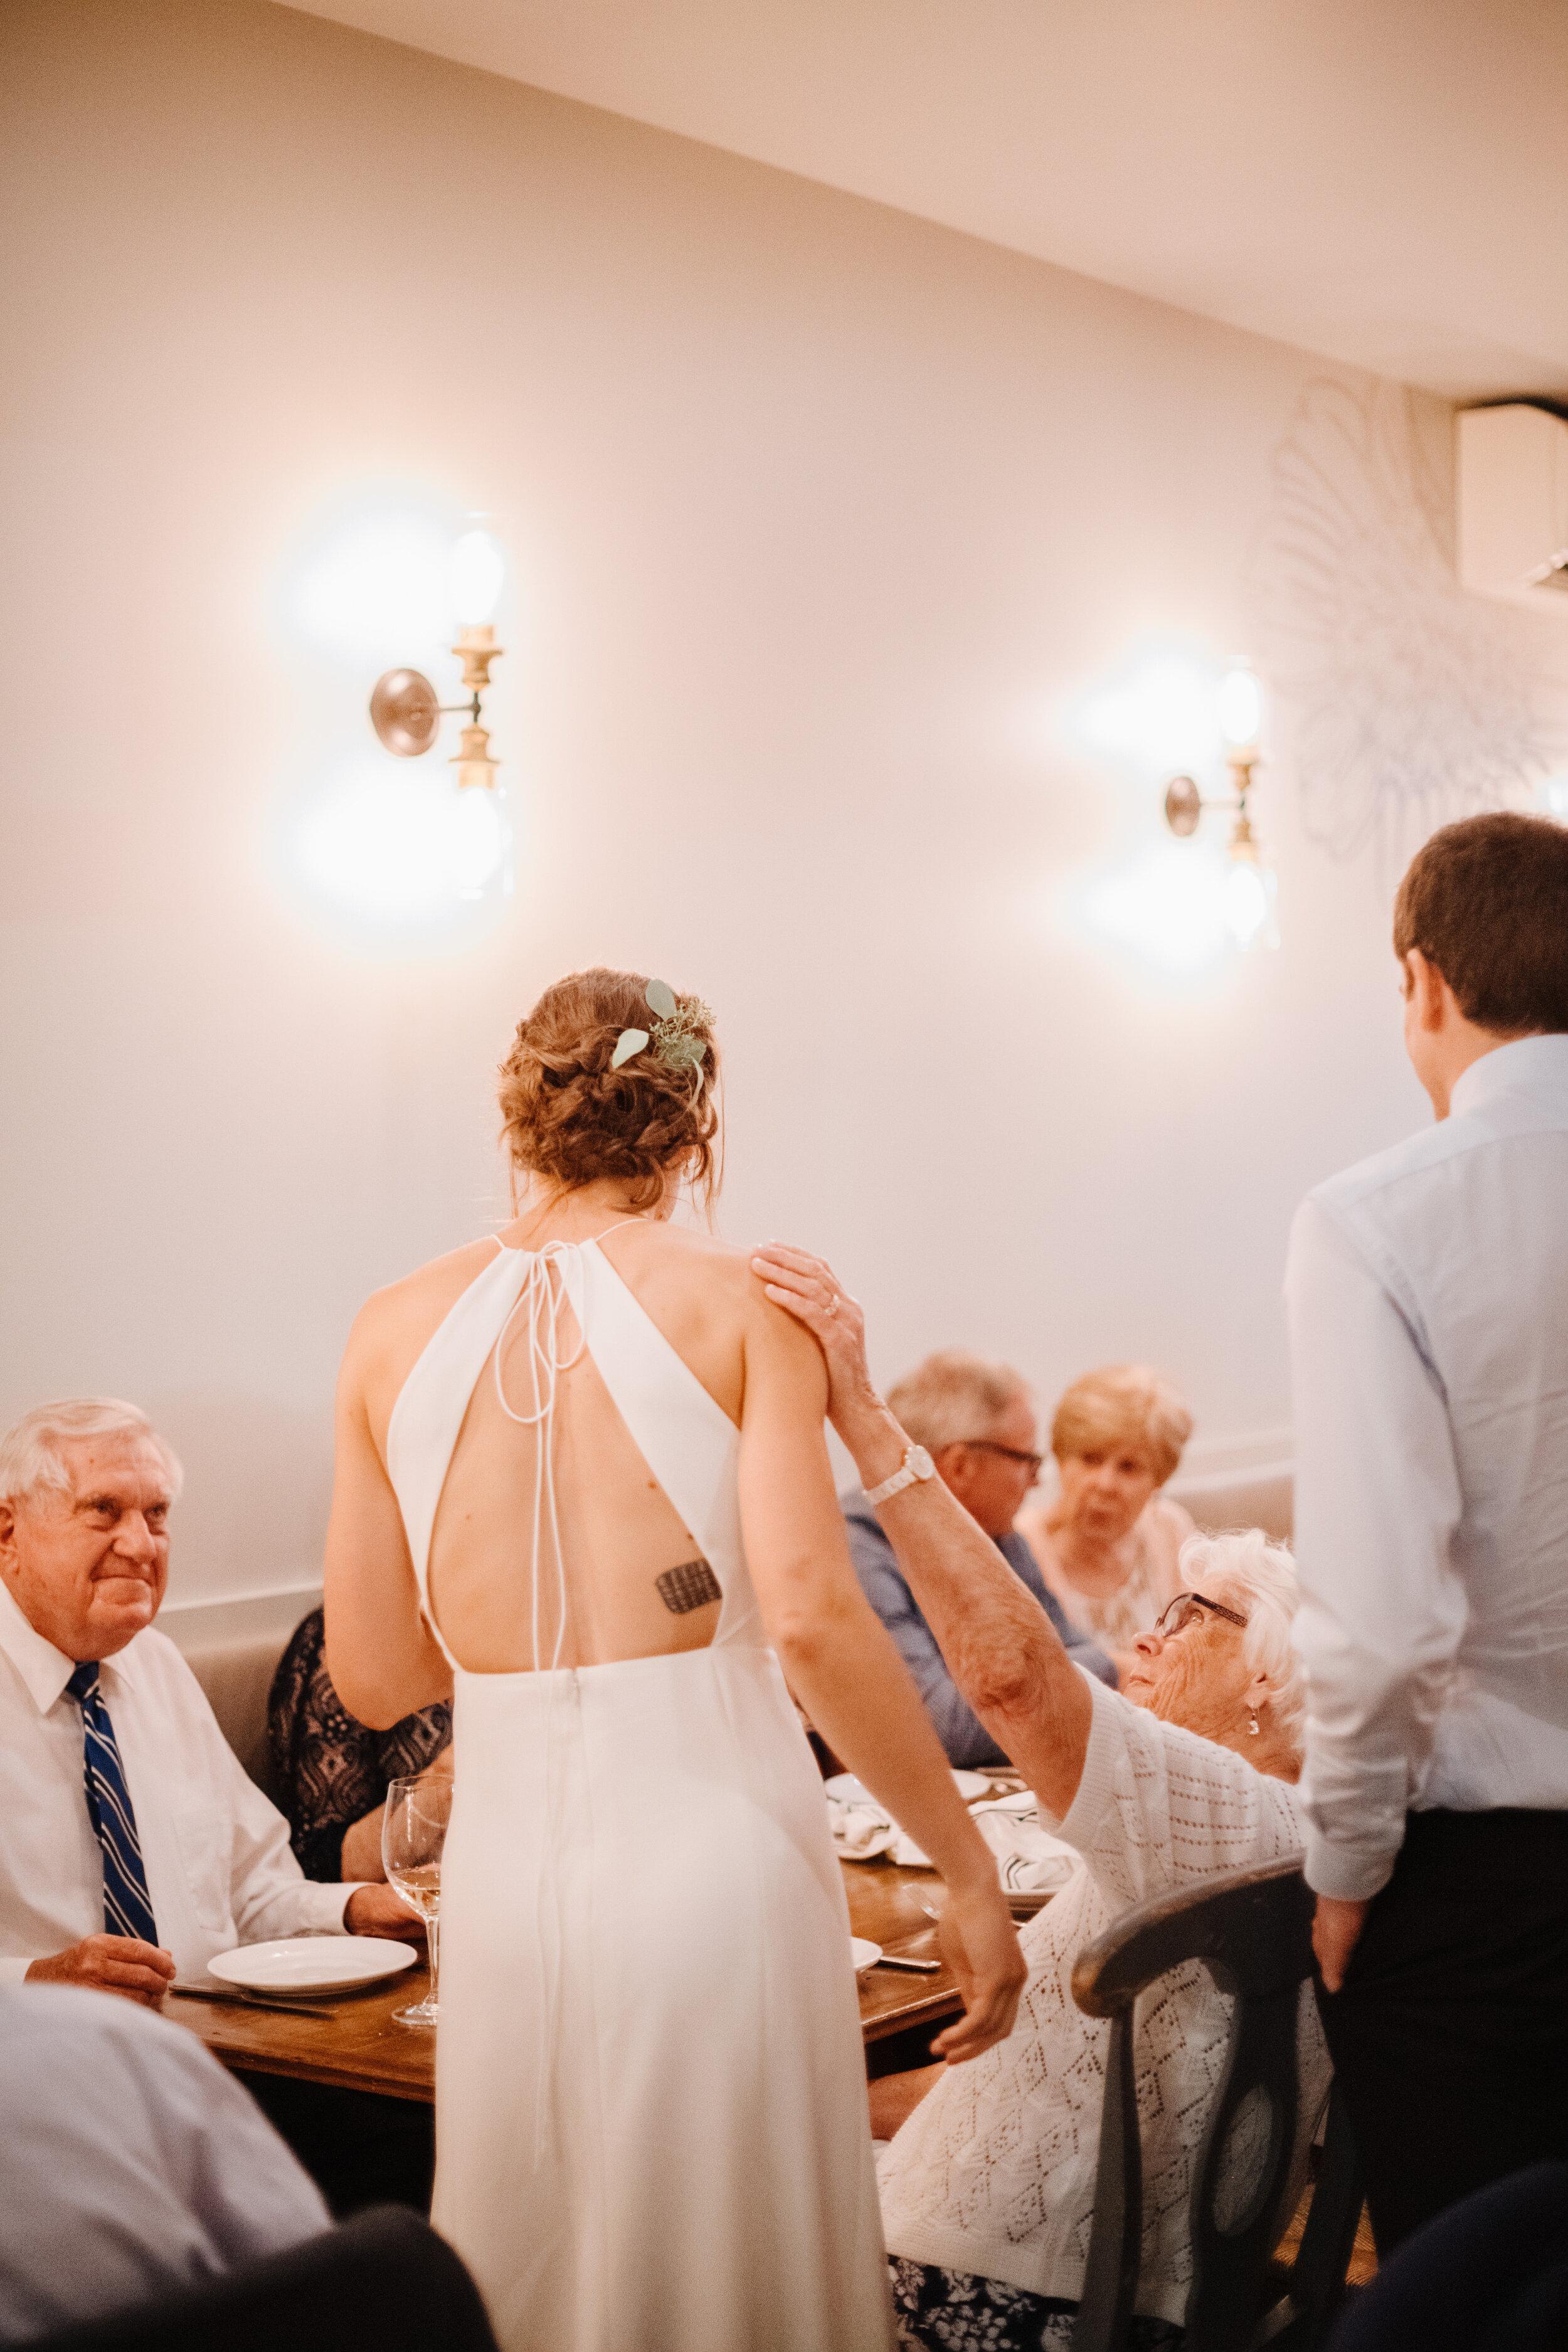 portland_city_hall_wedding_mikhail_glabet_46.JPG